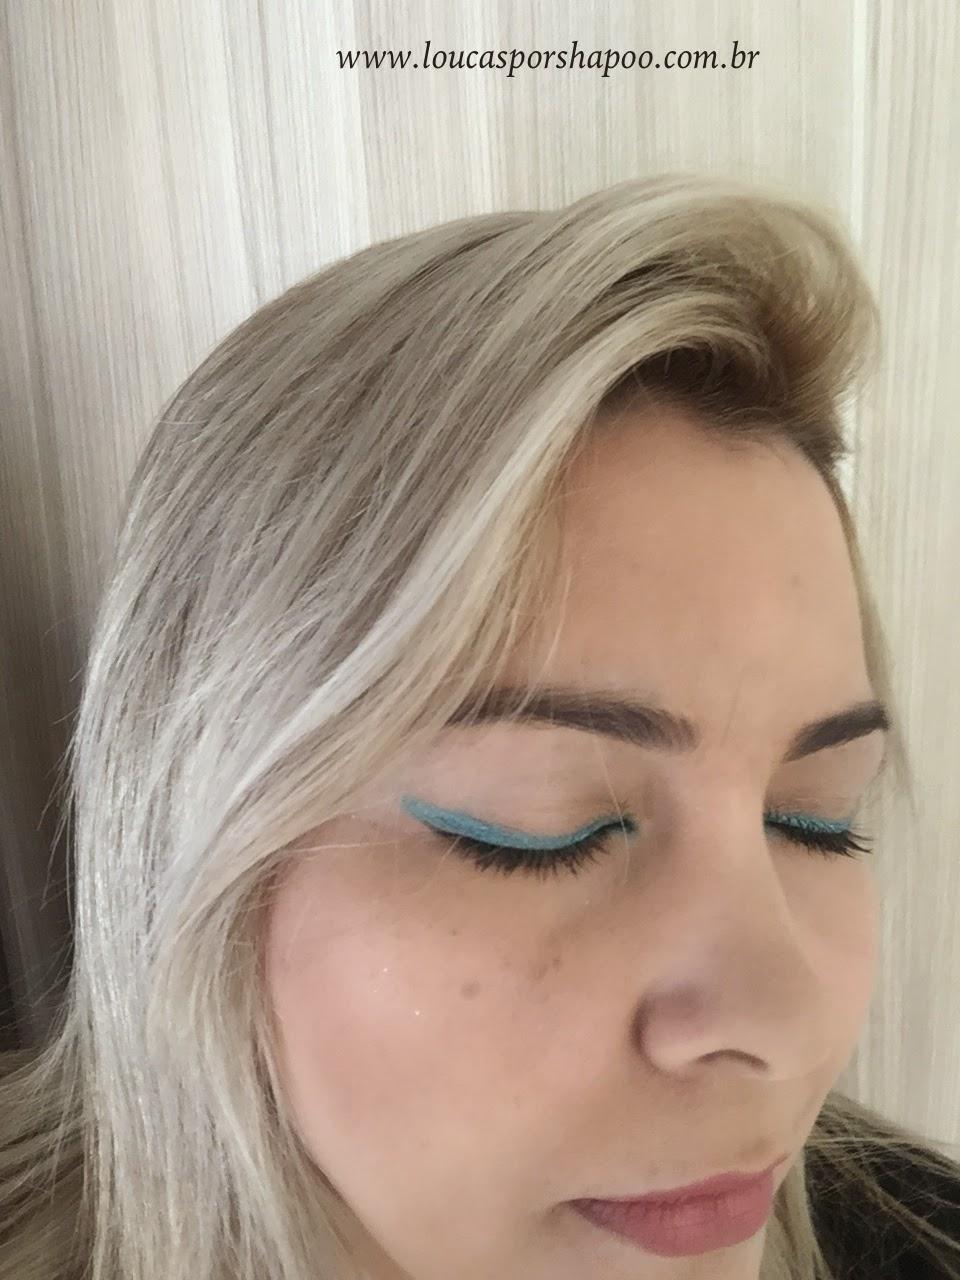 loucasporshampoo makeup ombre sombra azul trio Baked elke